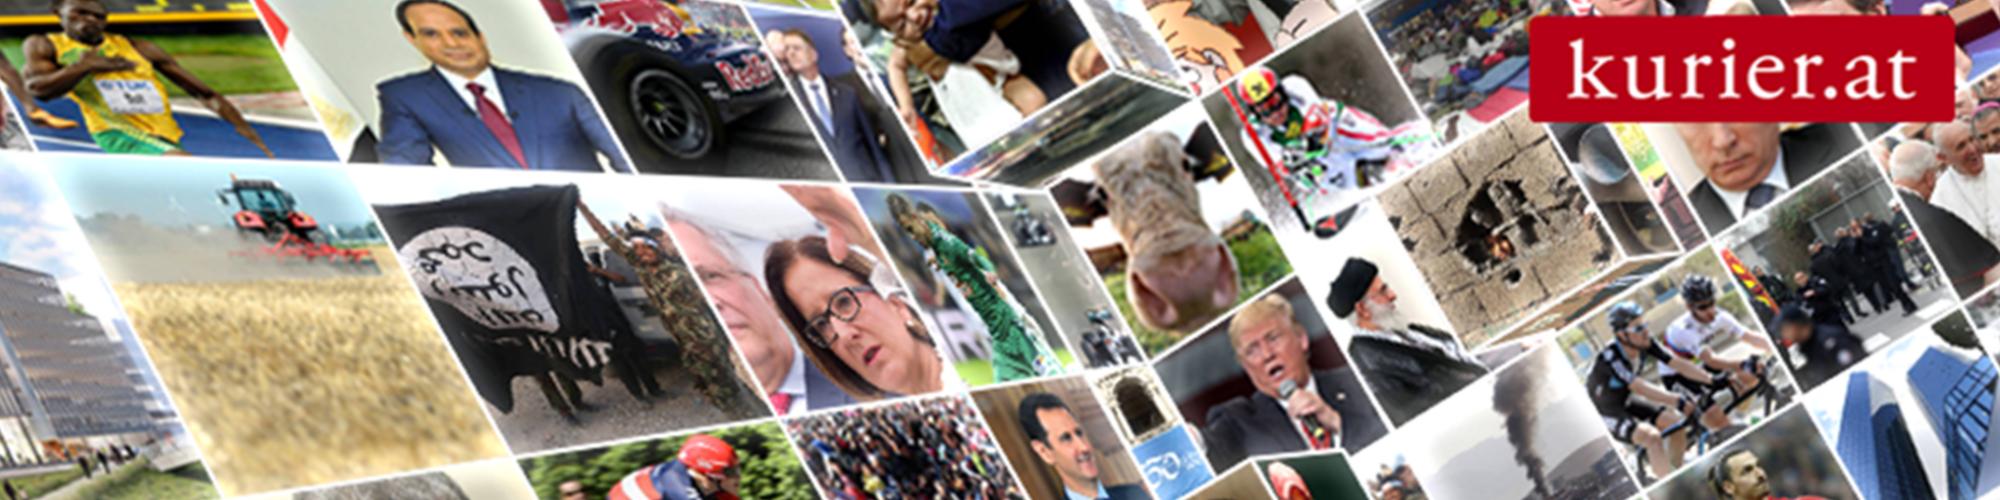 Telekurier Online Medien GmbH & Co. KG